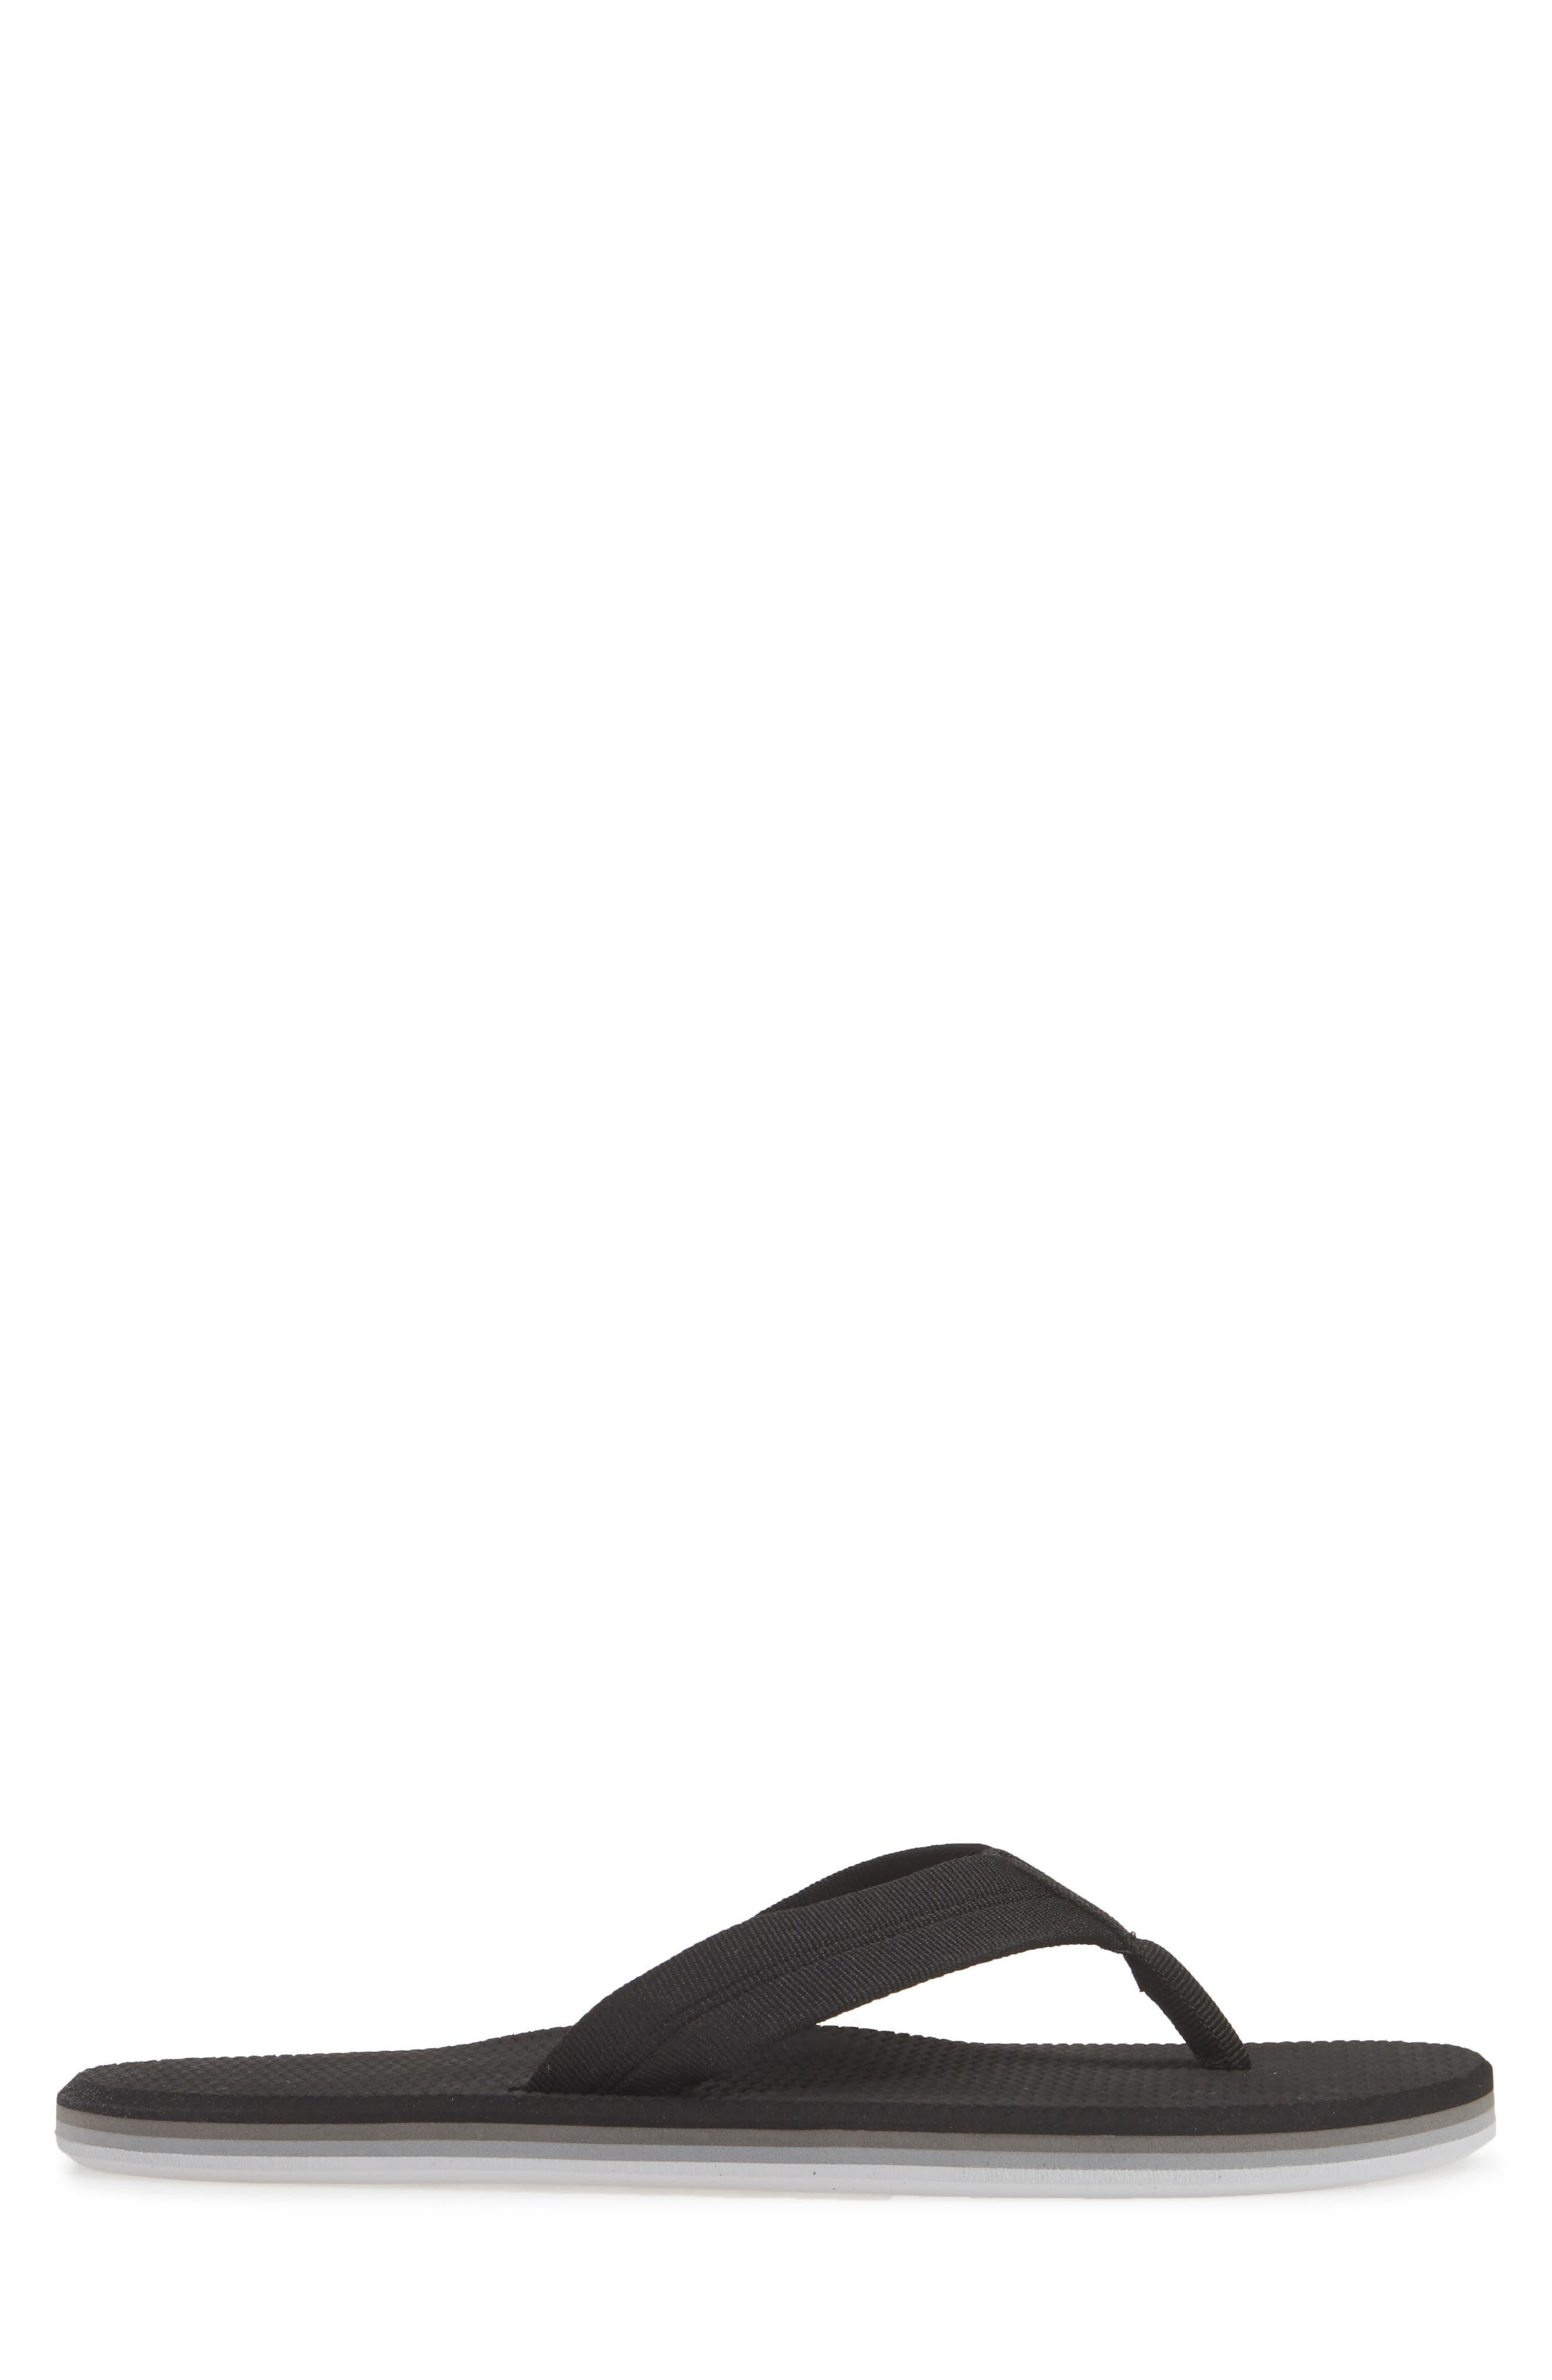 HARI MARI, 'Dunes' Flip Flop, Alternate thumbnail 3, color, BLACK